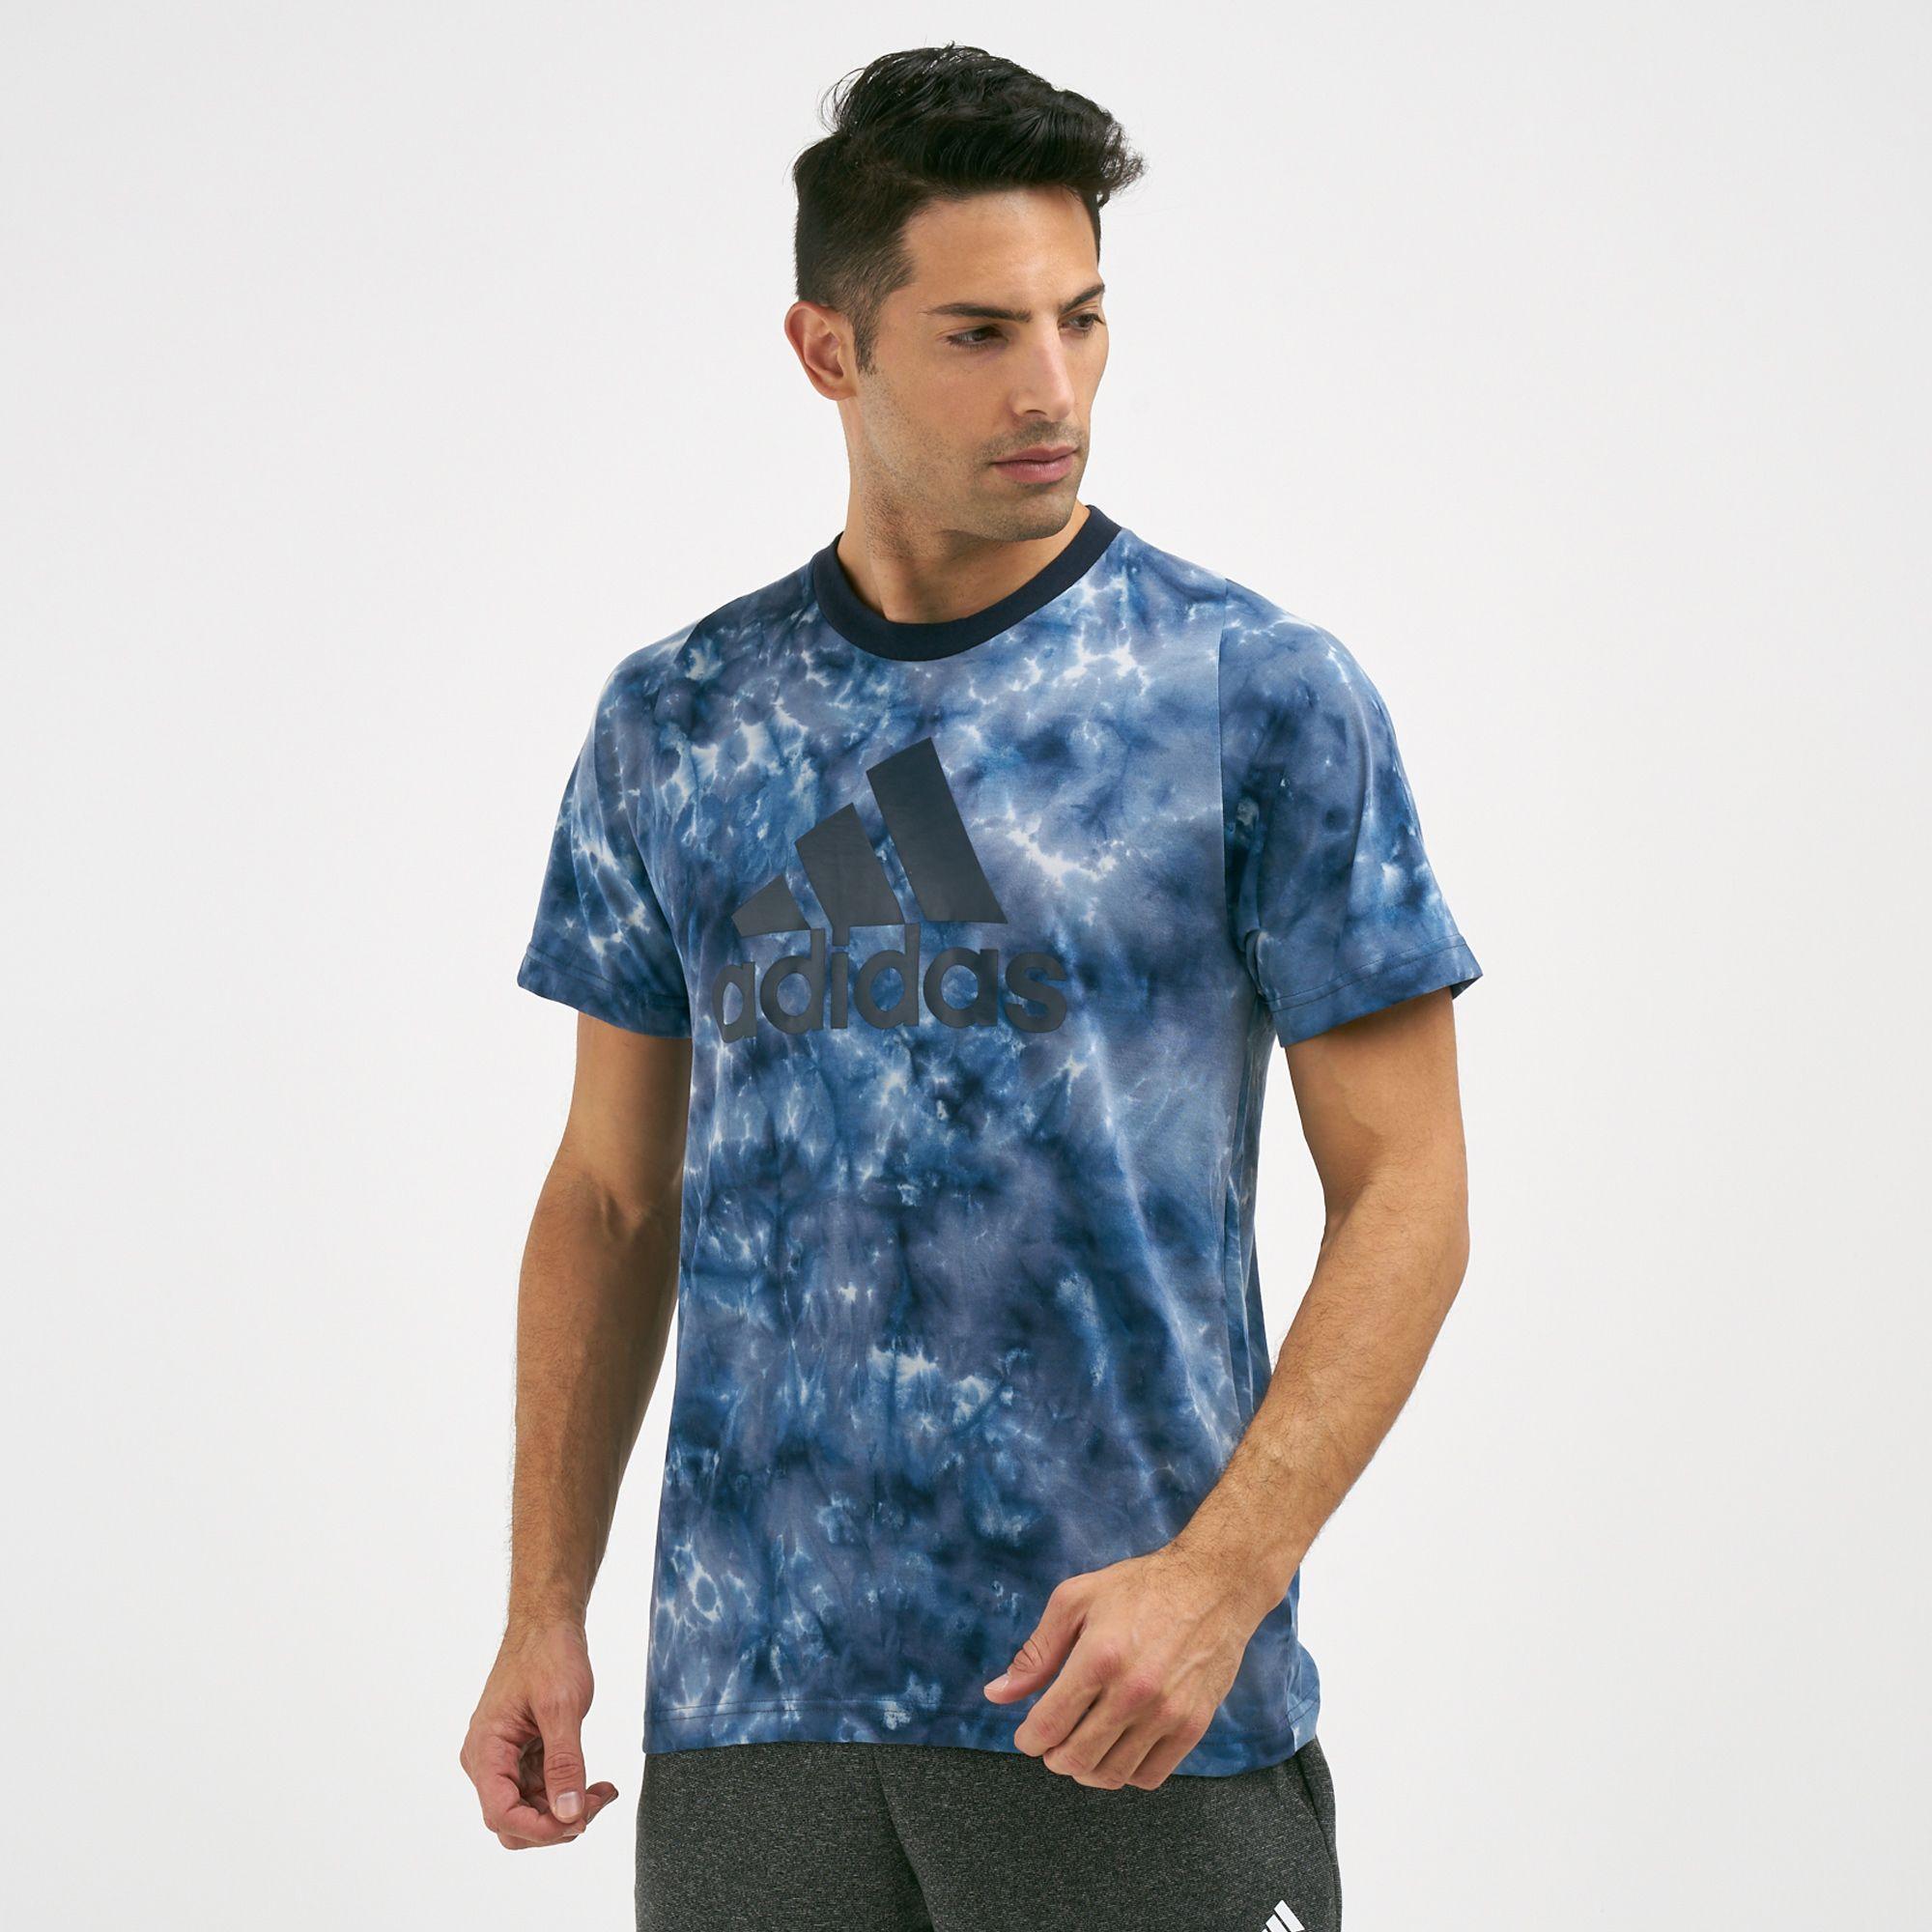 adidas Men's ID Spray Dye T-Shirt